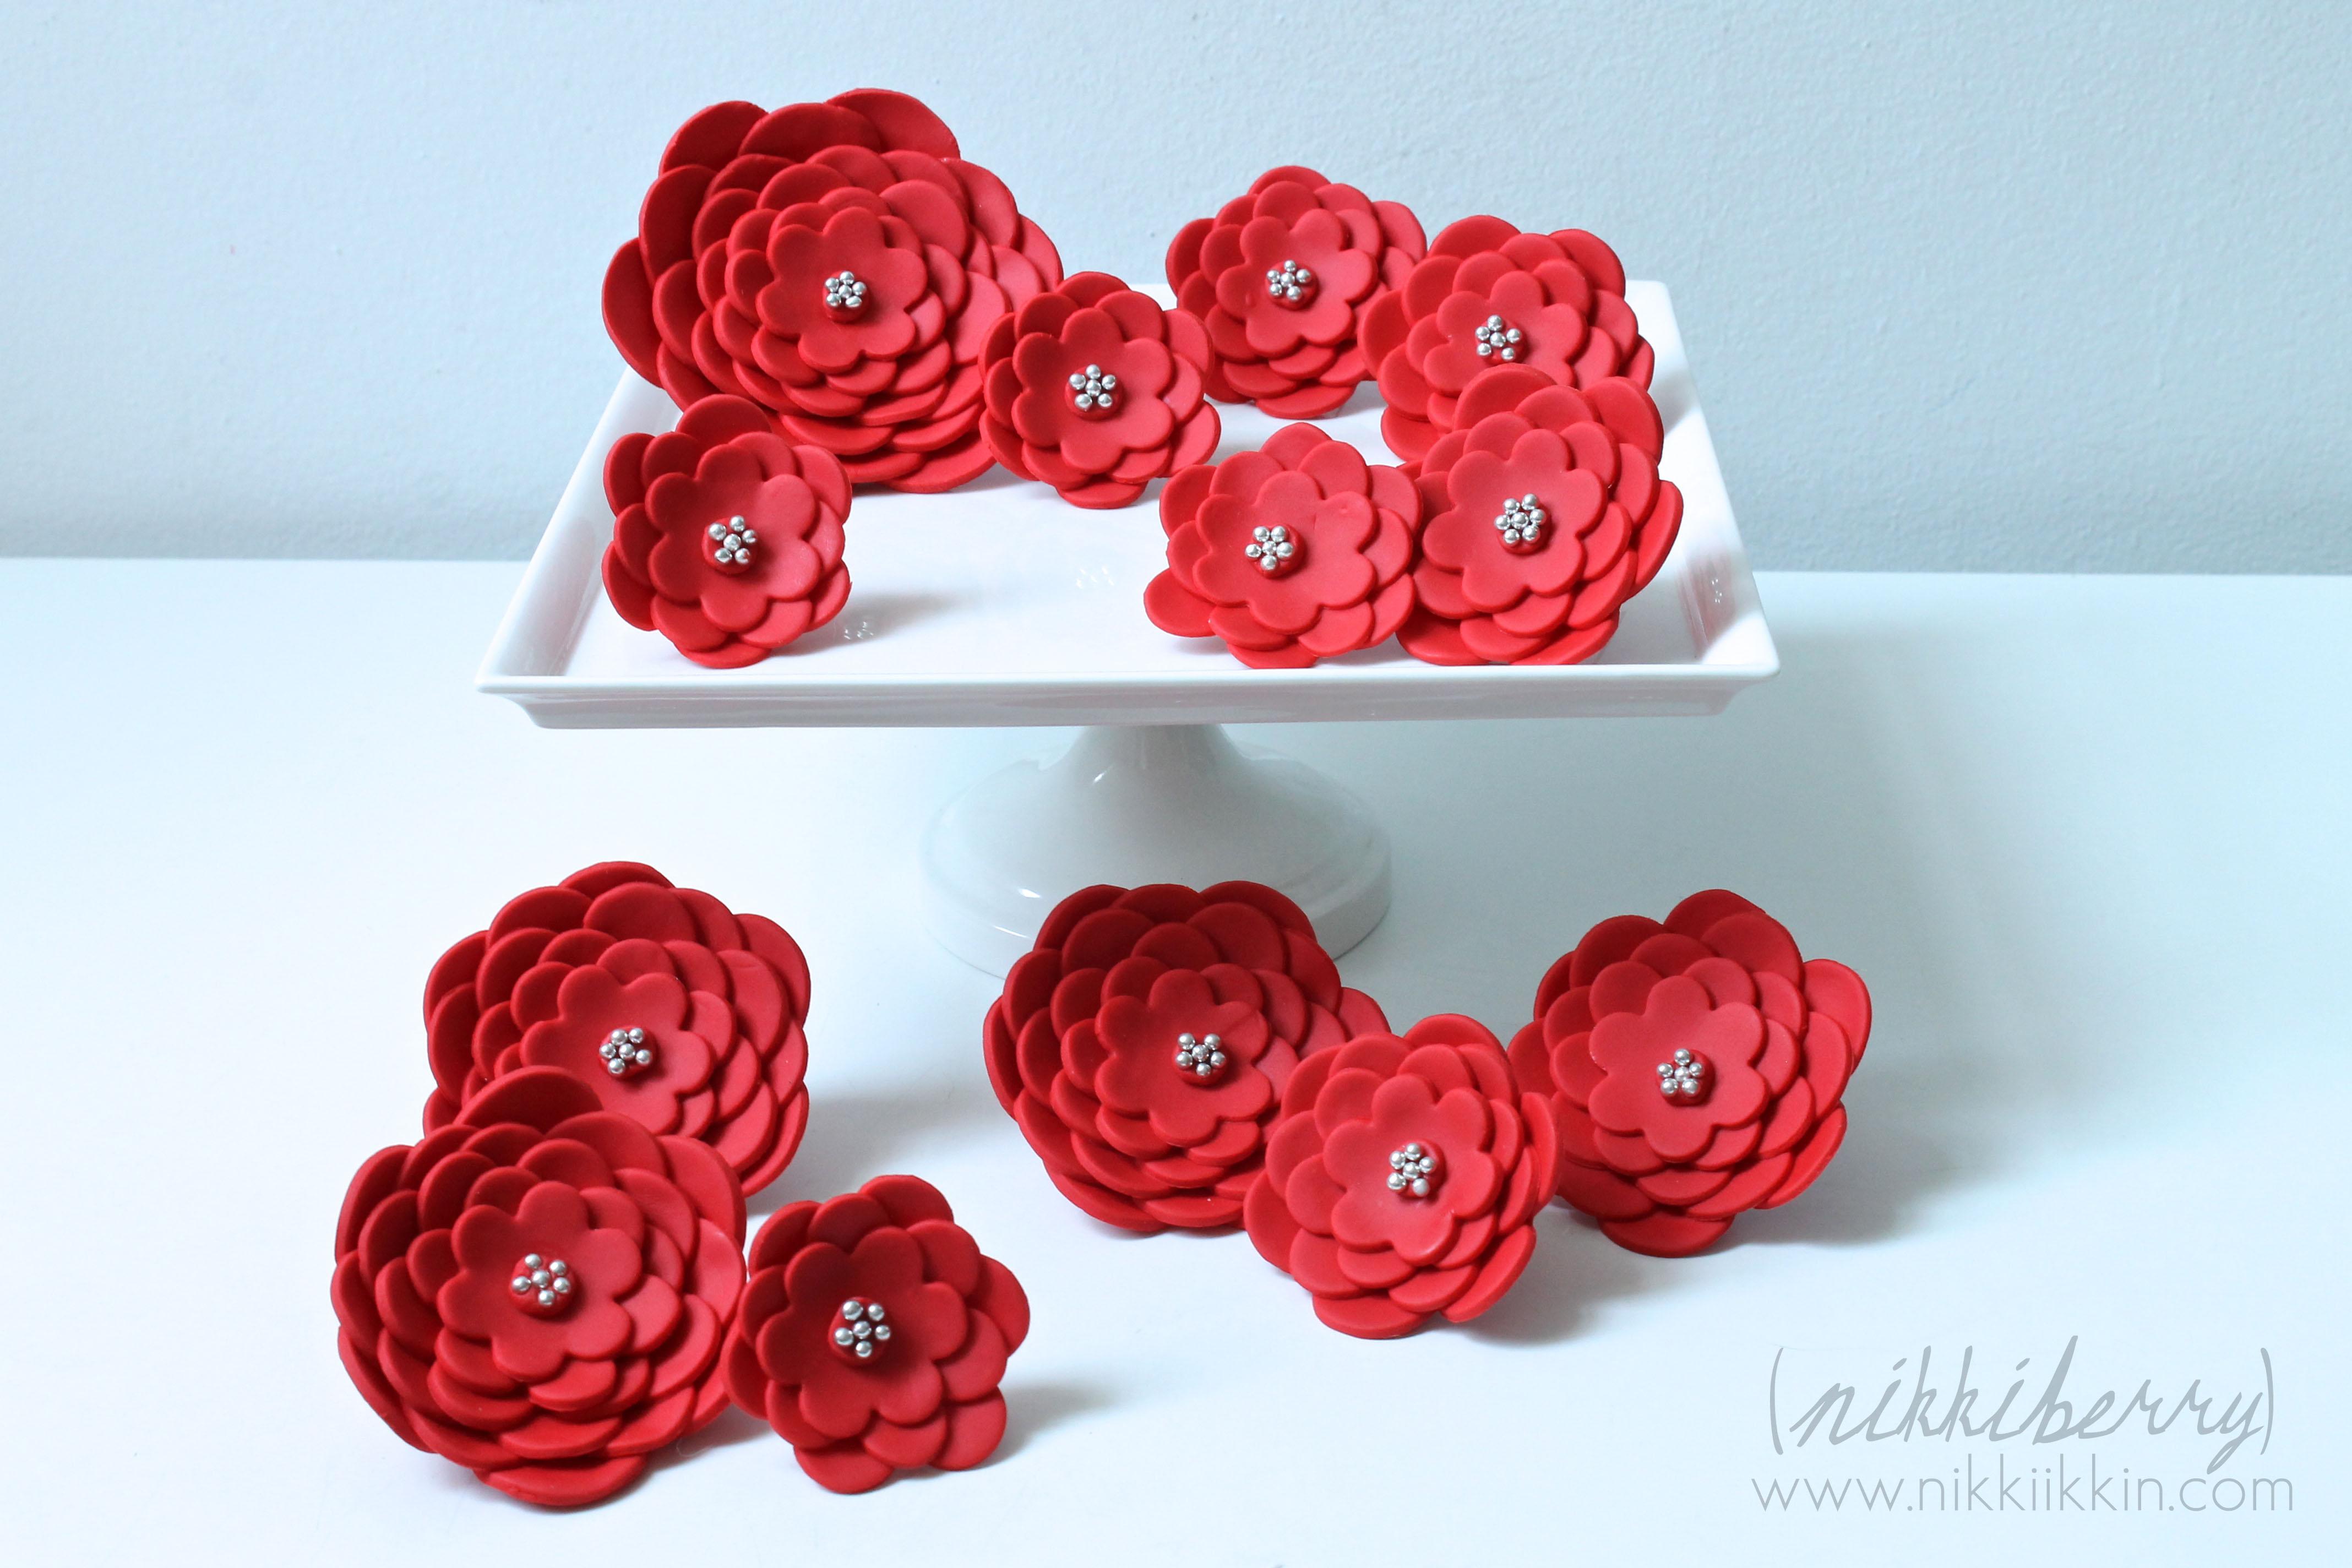 Modern diy cakes nikkiikkin cake flowers 1 izmirmasajfo